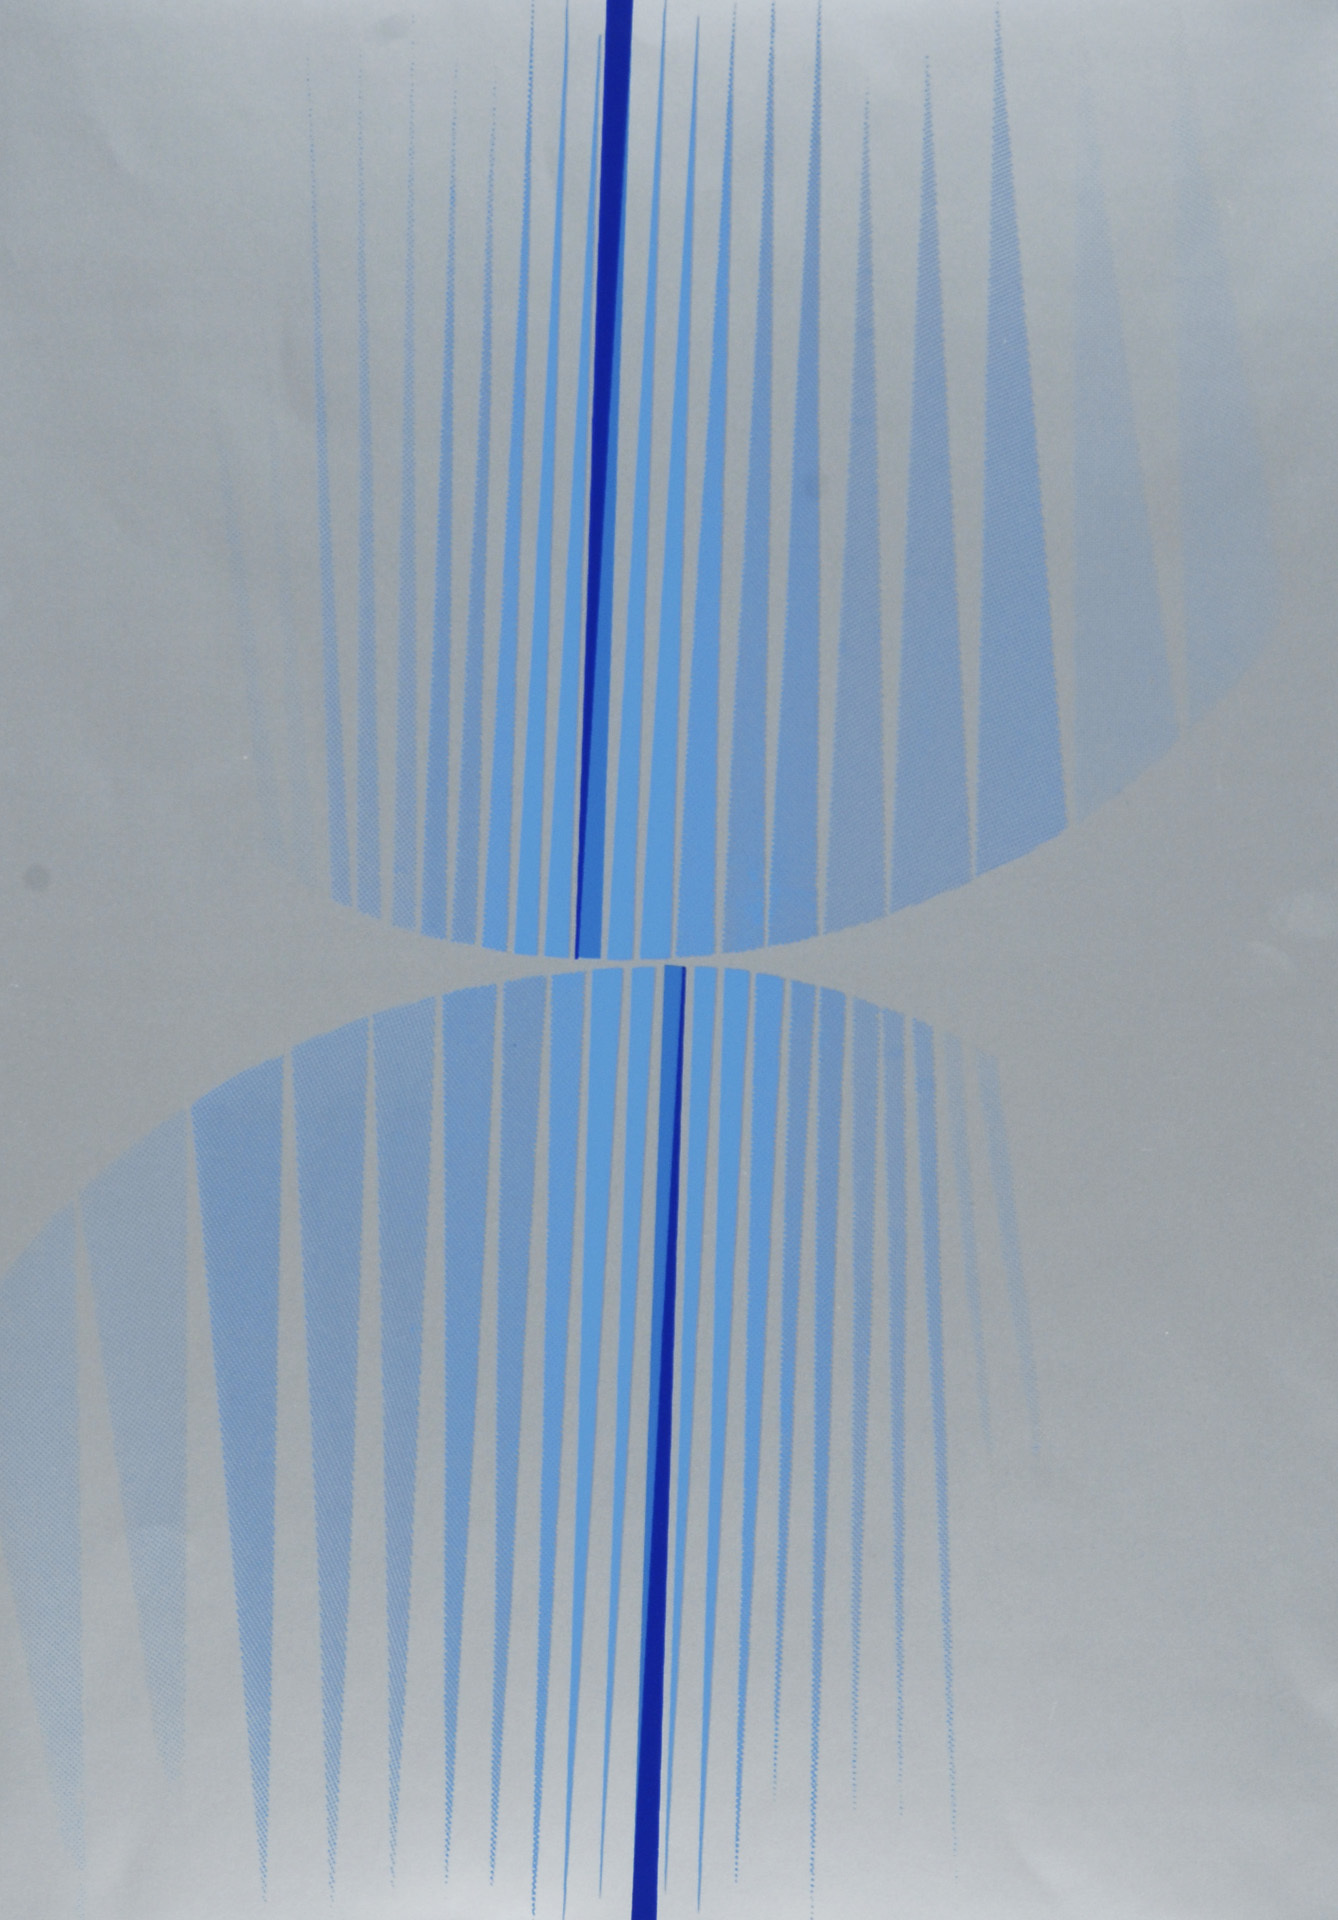 Quinte Lothar, 2 sheets: Schwarz-Rot, 1966; Blau auf Silber